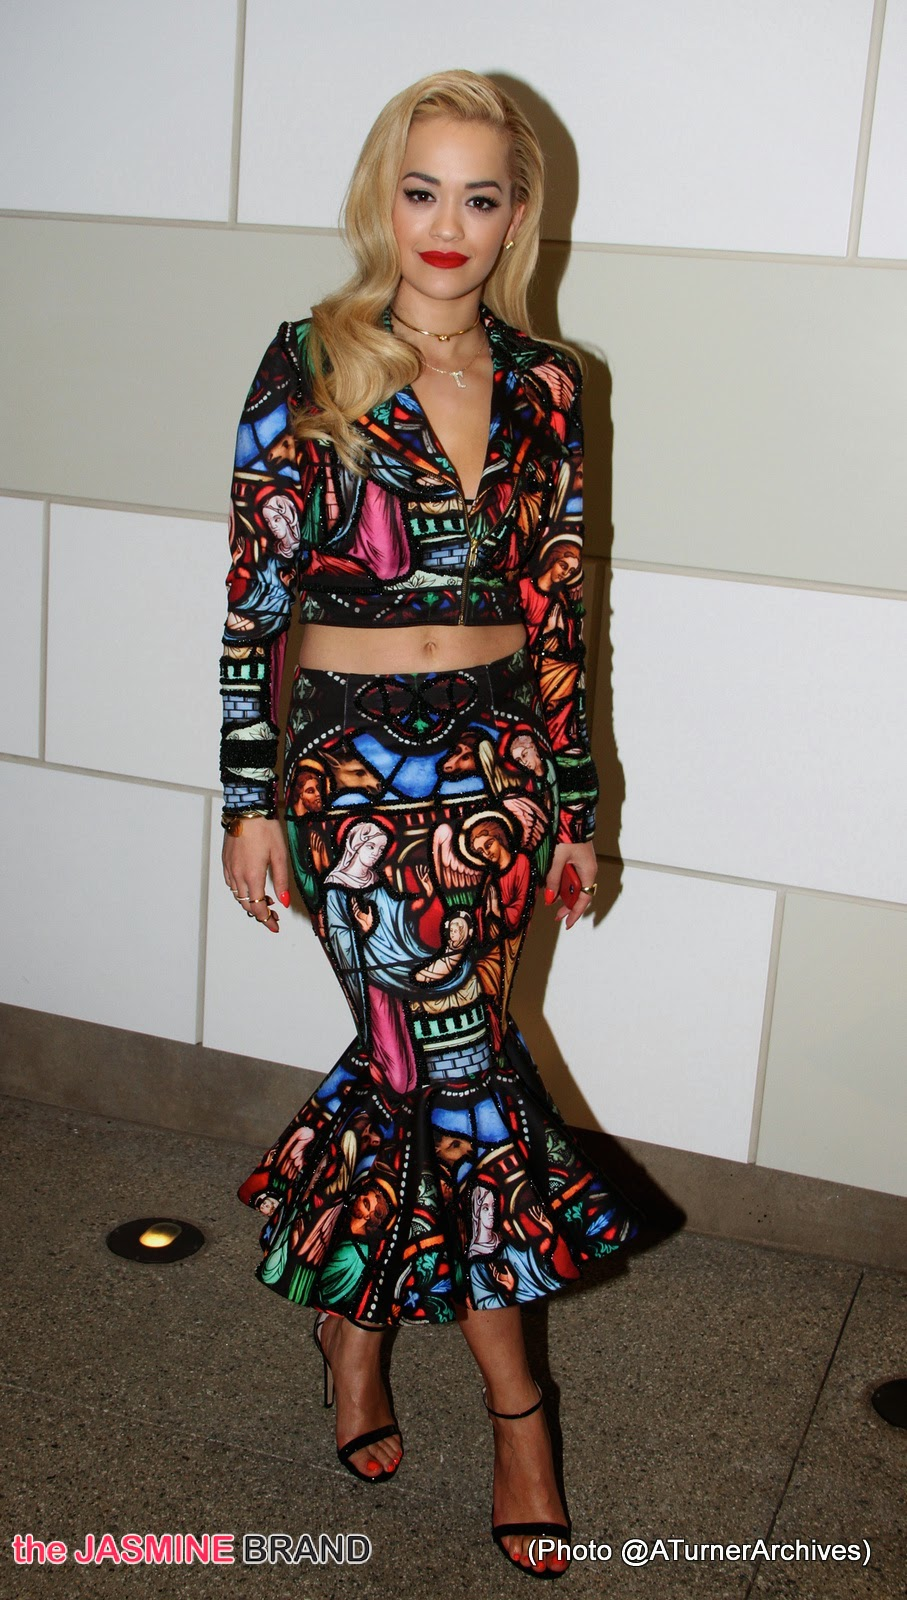 Rita Ora-the jasmine brand